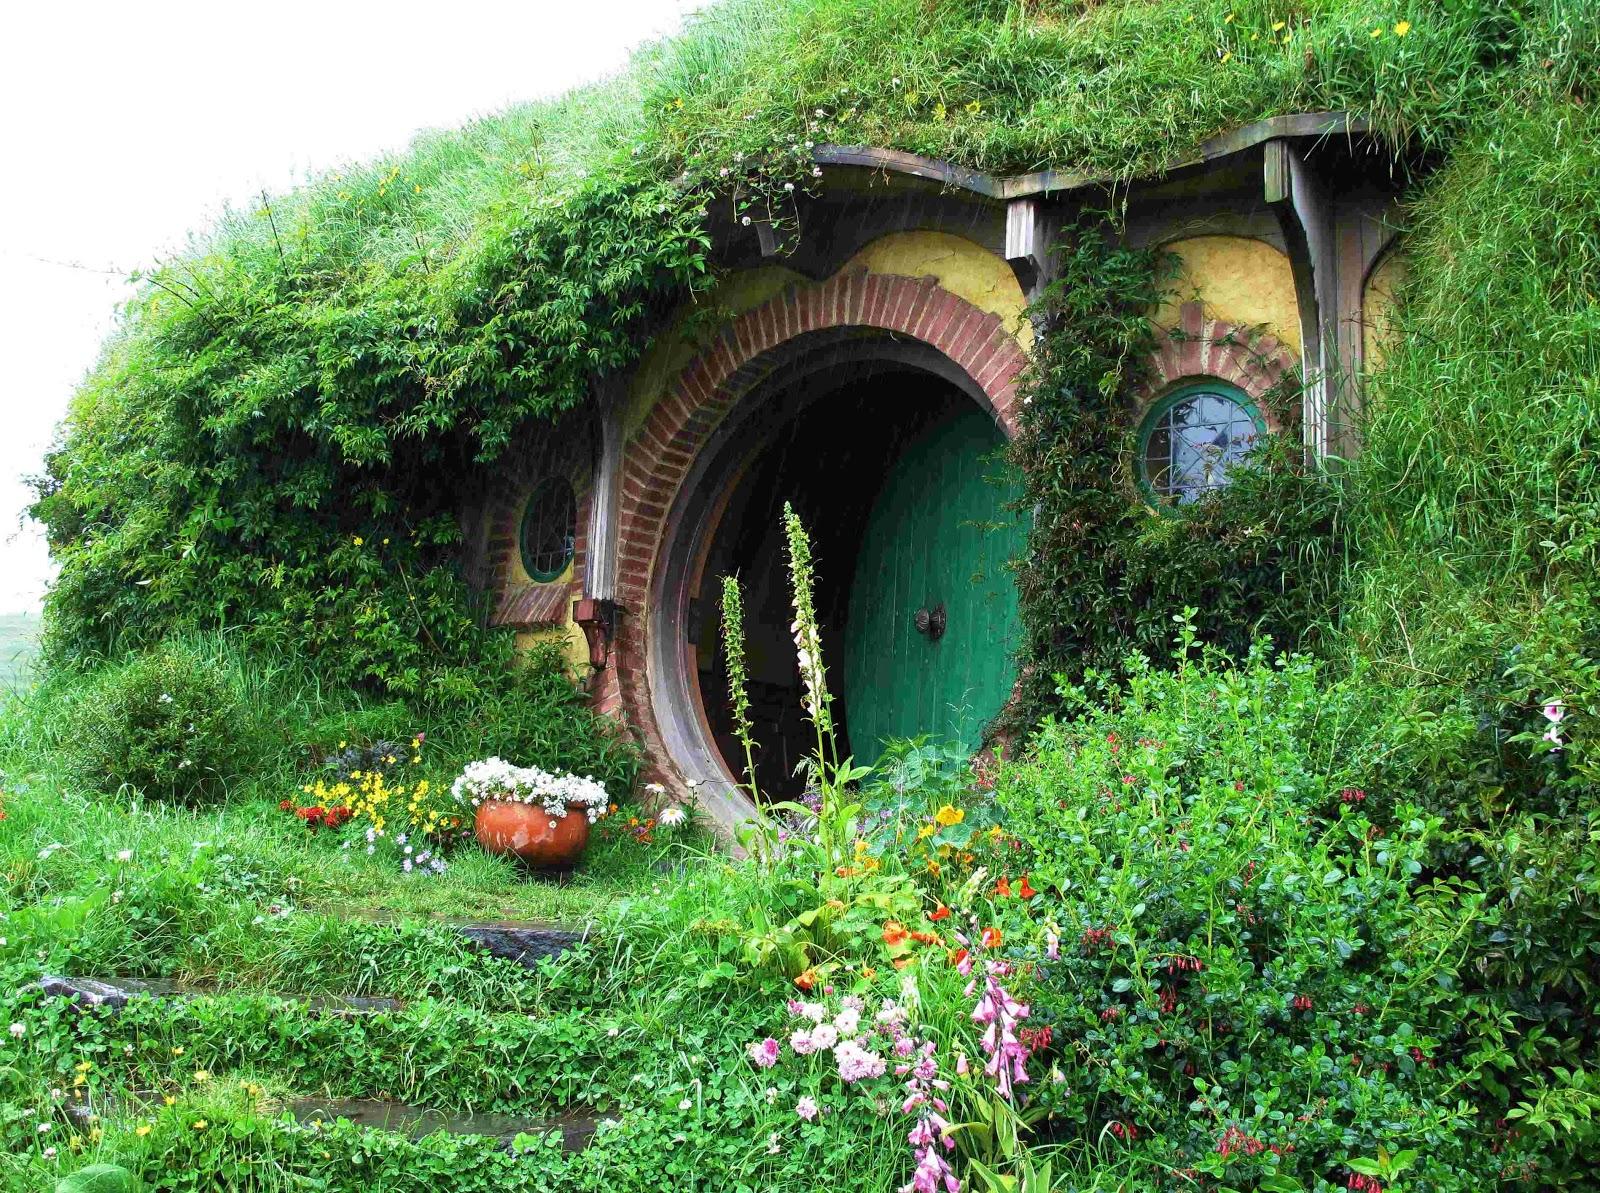 Lord Of The Rings Hobbit House Door Interesting The Hobbit